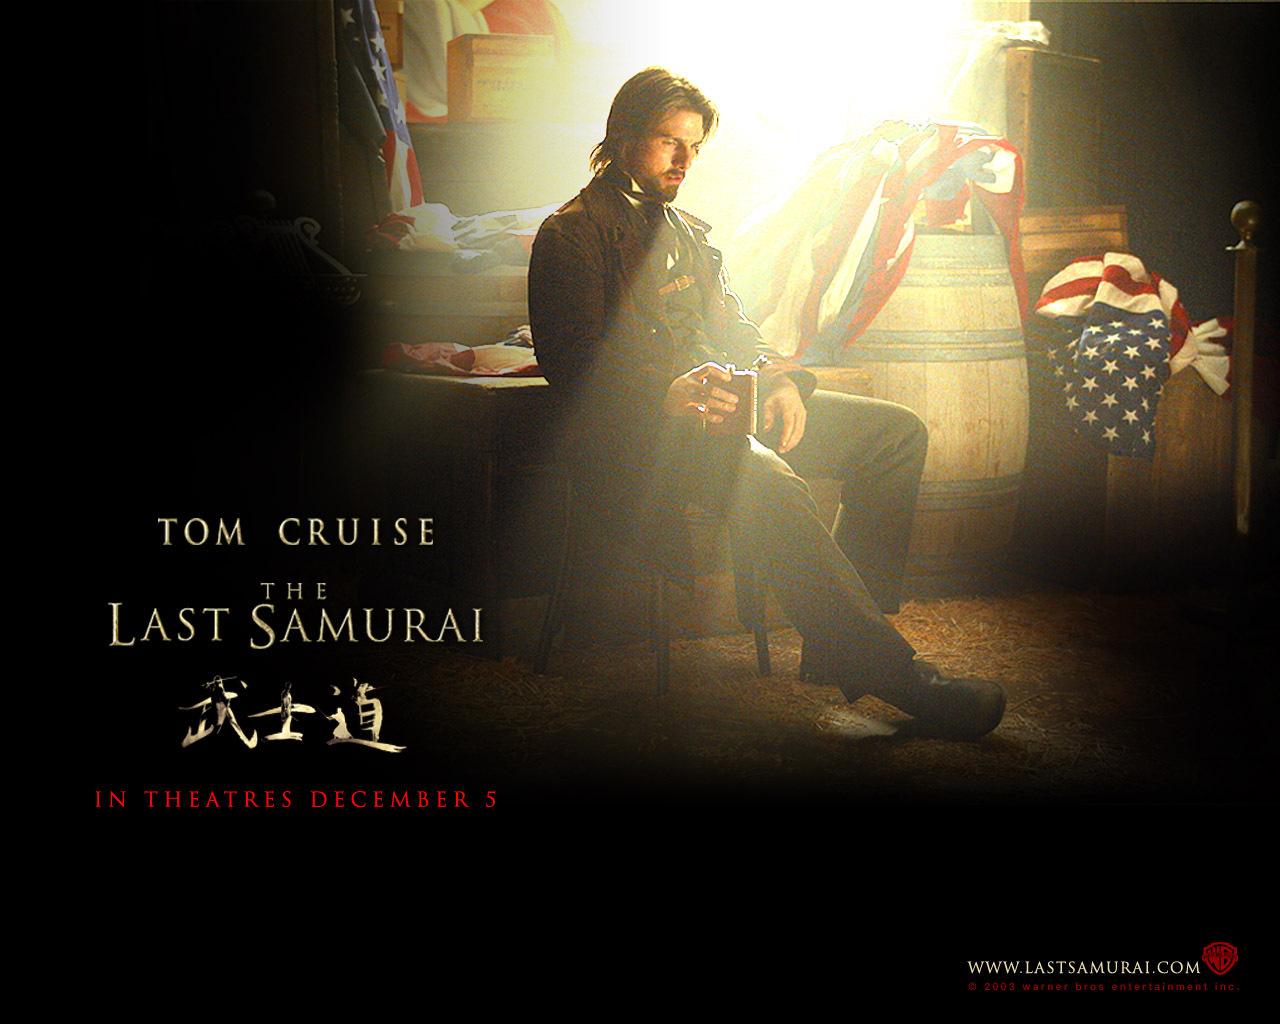 the last samurai wallpaper on wallpapersafari the last samurai images the last samurai hd wallpaper and x